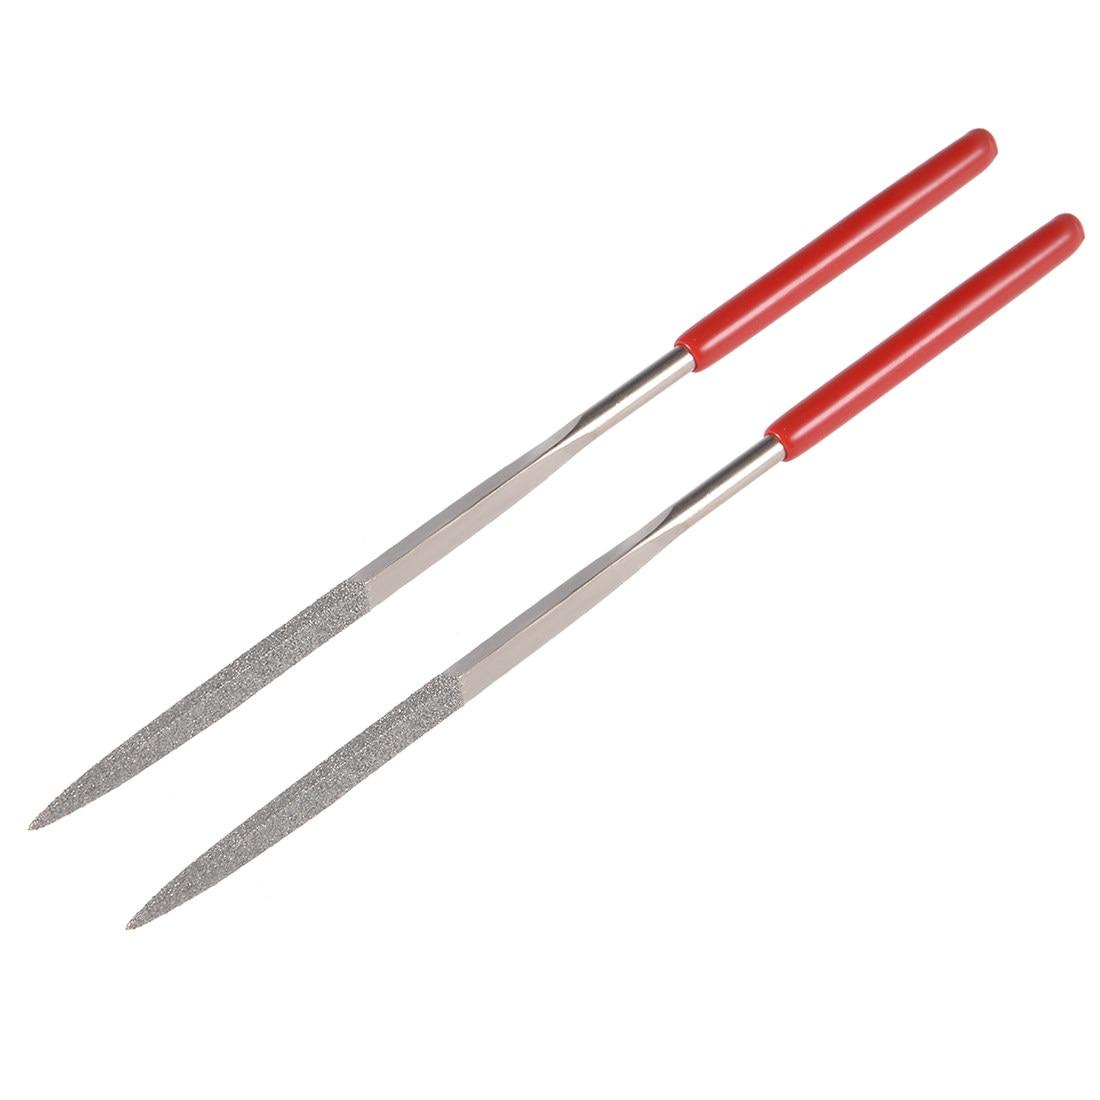 uxcell 5Pcs 3mm x 140mm Square Diamond Needle File 150 Grit